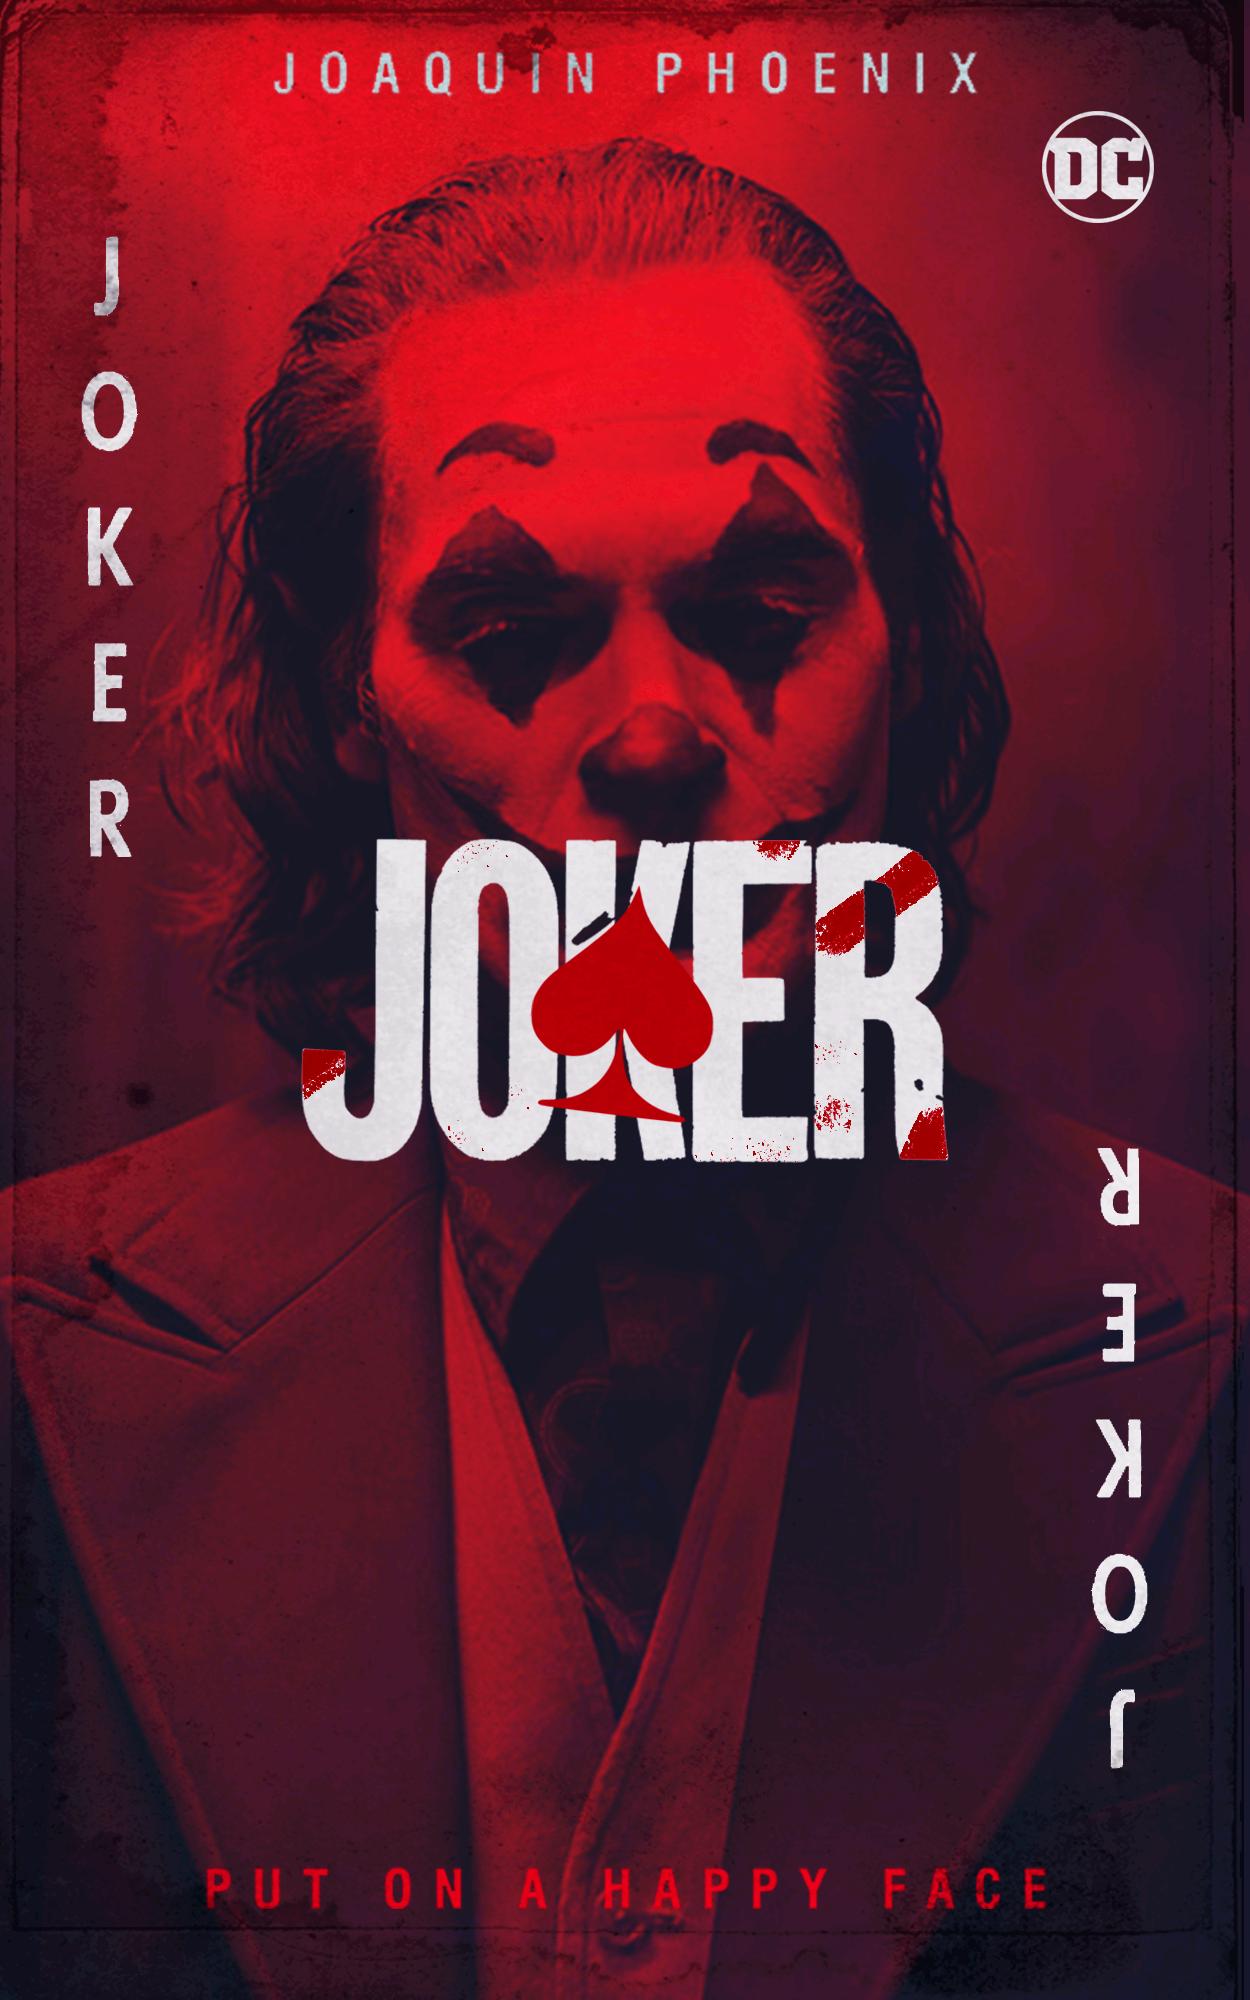 [Artwork] Joker - Put on a happy face 🃏